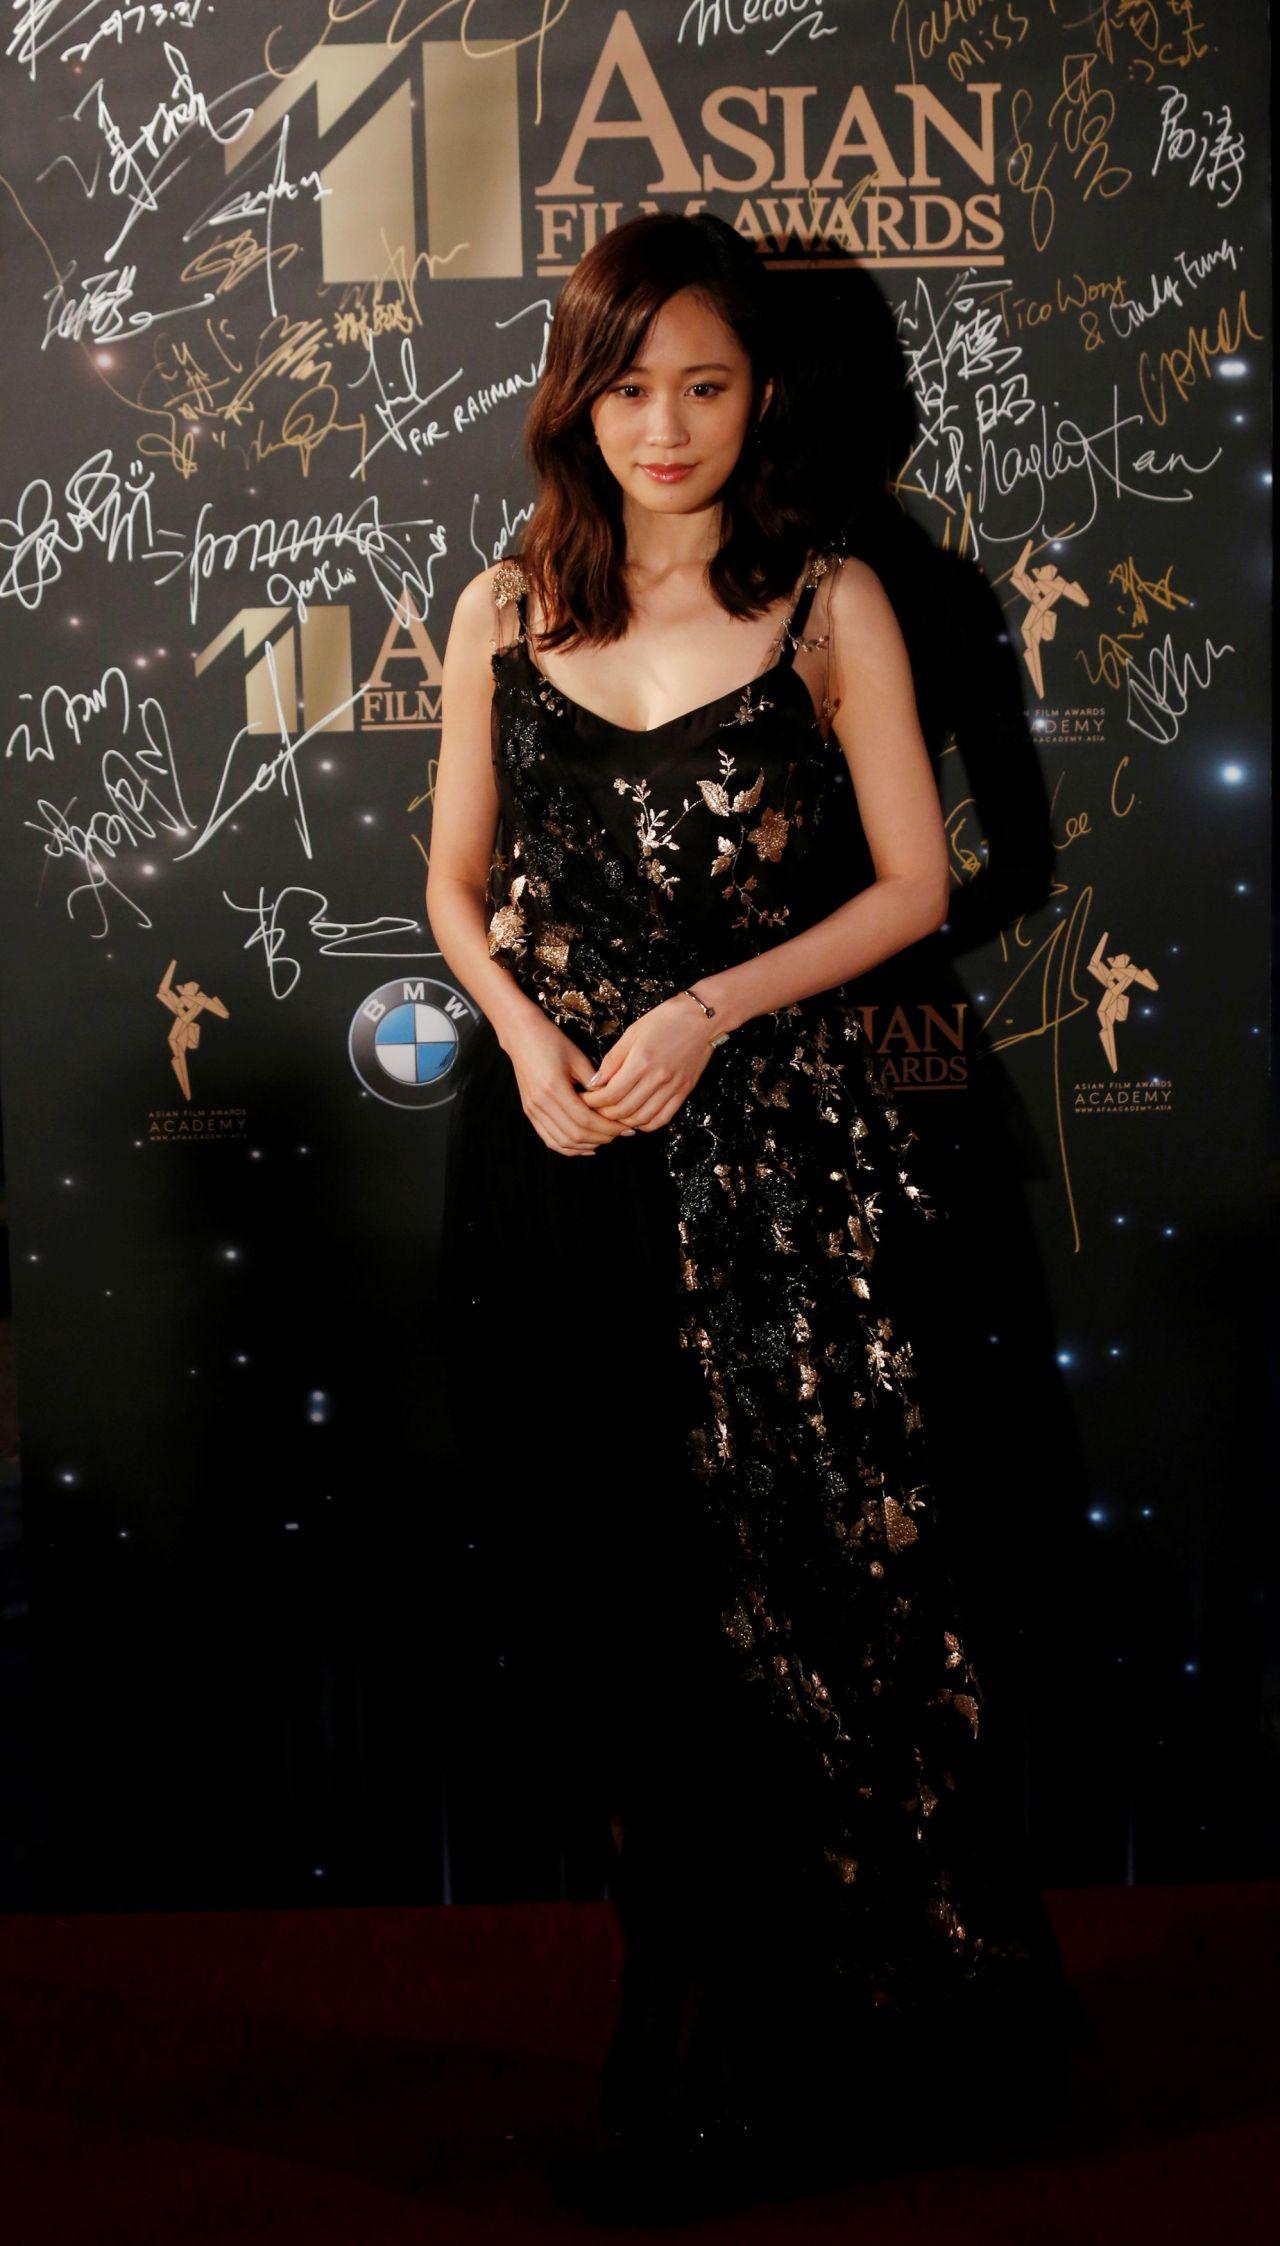 3rd Asian Film Awards - Wikipedia